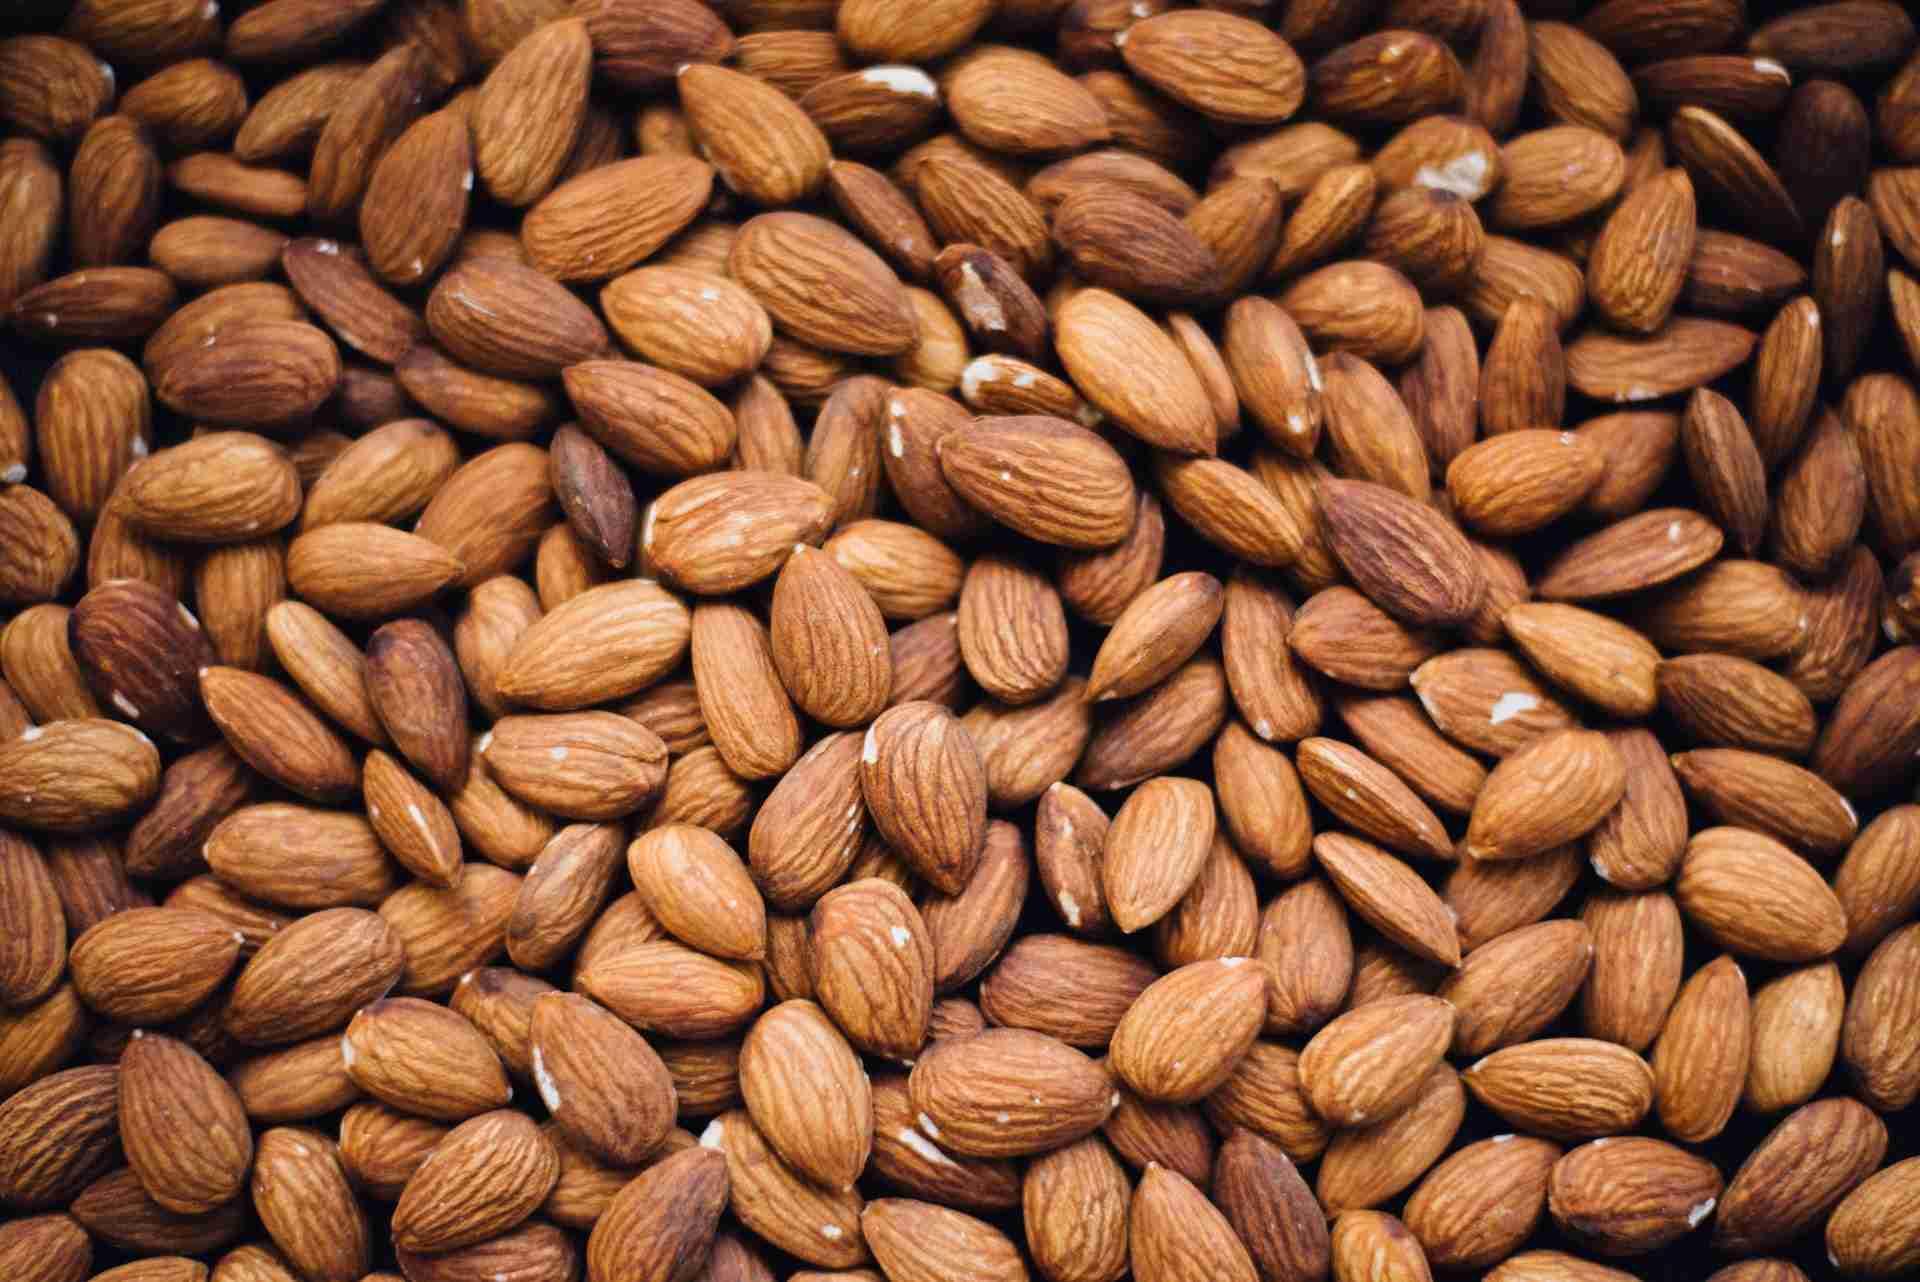 Benefits of walnut (2020)